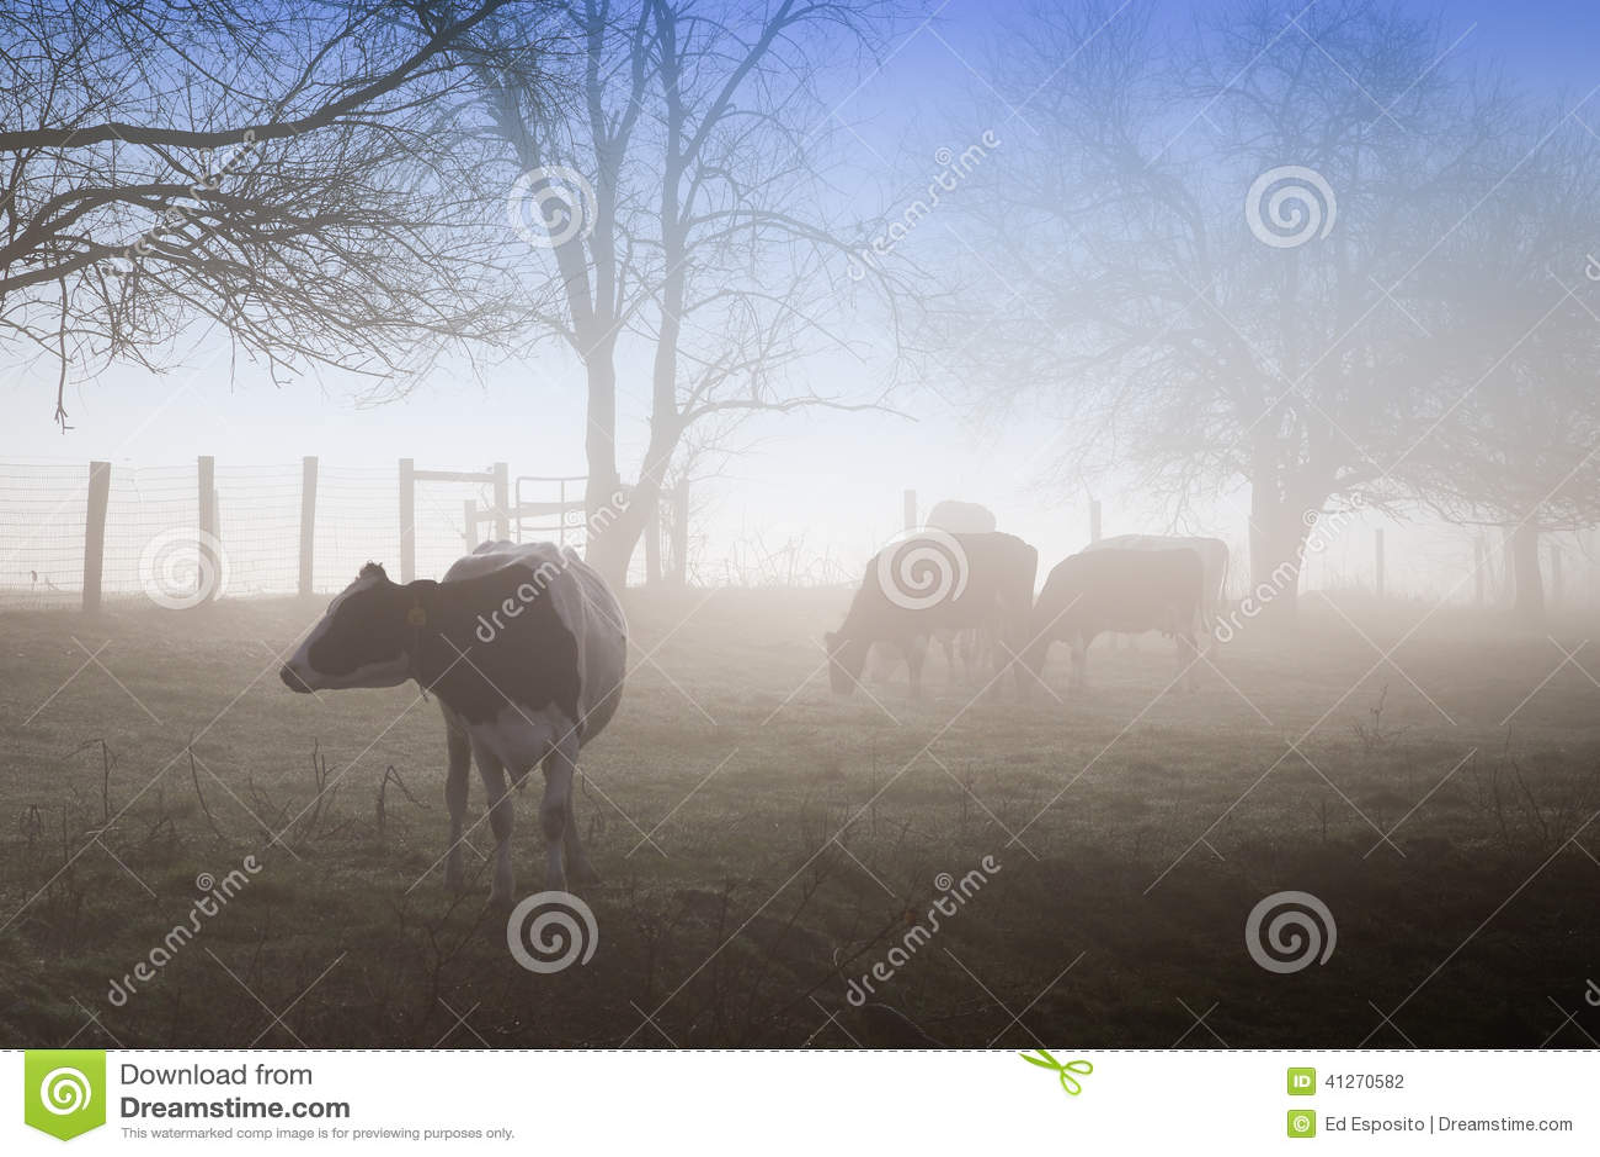 http://thumbs.dreamstime.com/z/vaches-en-brouillard-de-matin-41270582.jpg